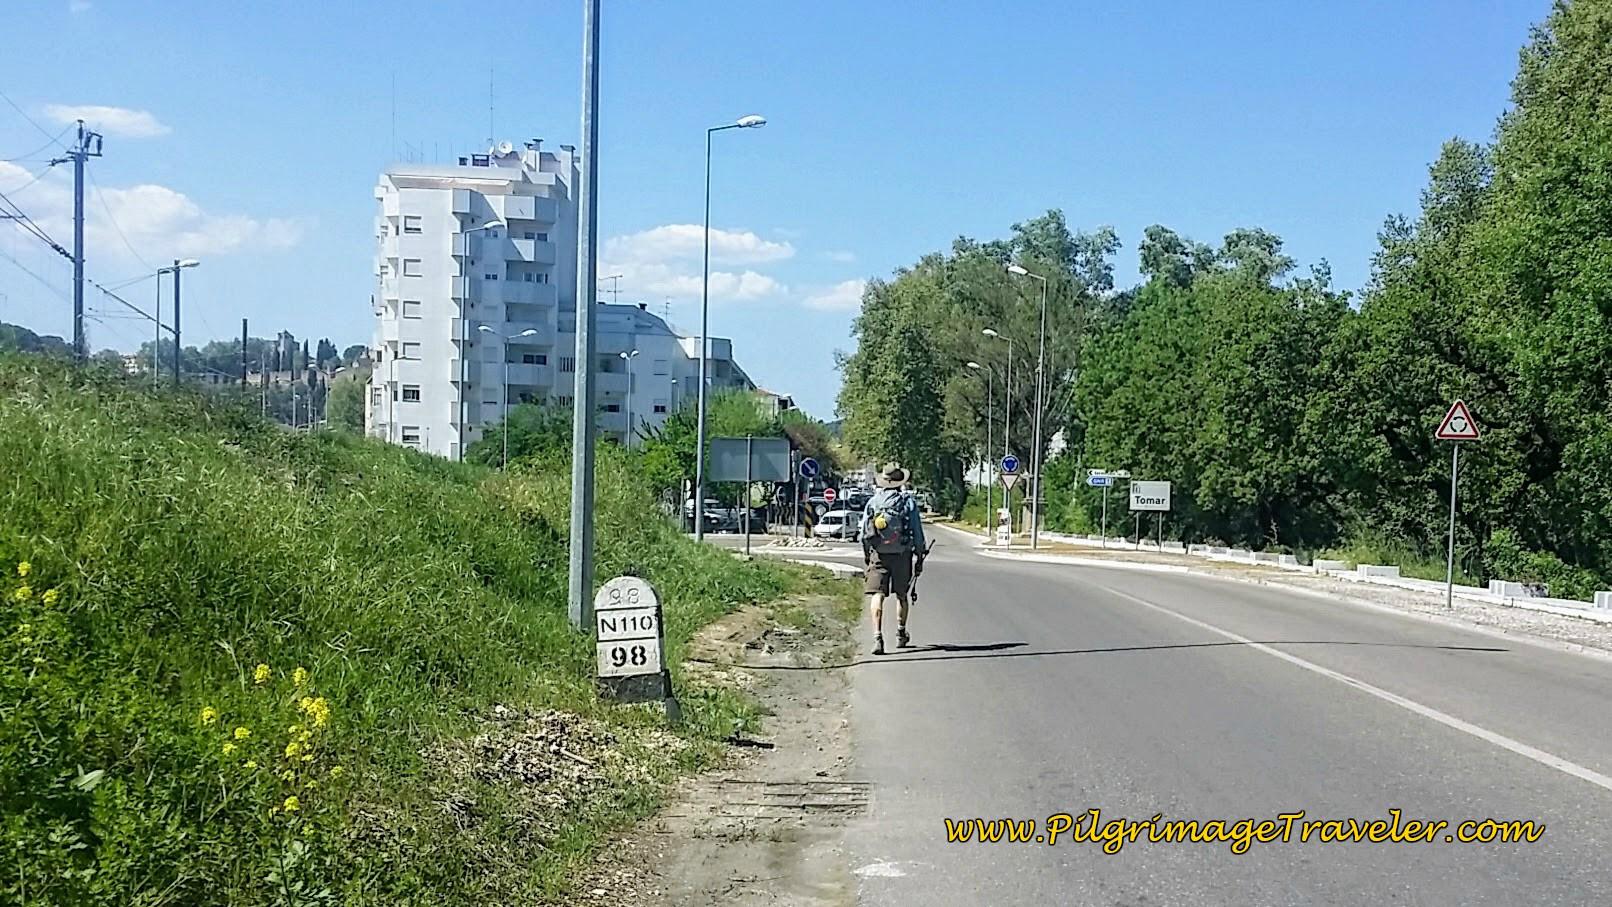 Entering Tomar on the Camino Portugués